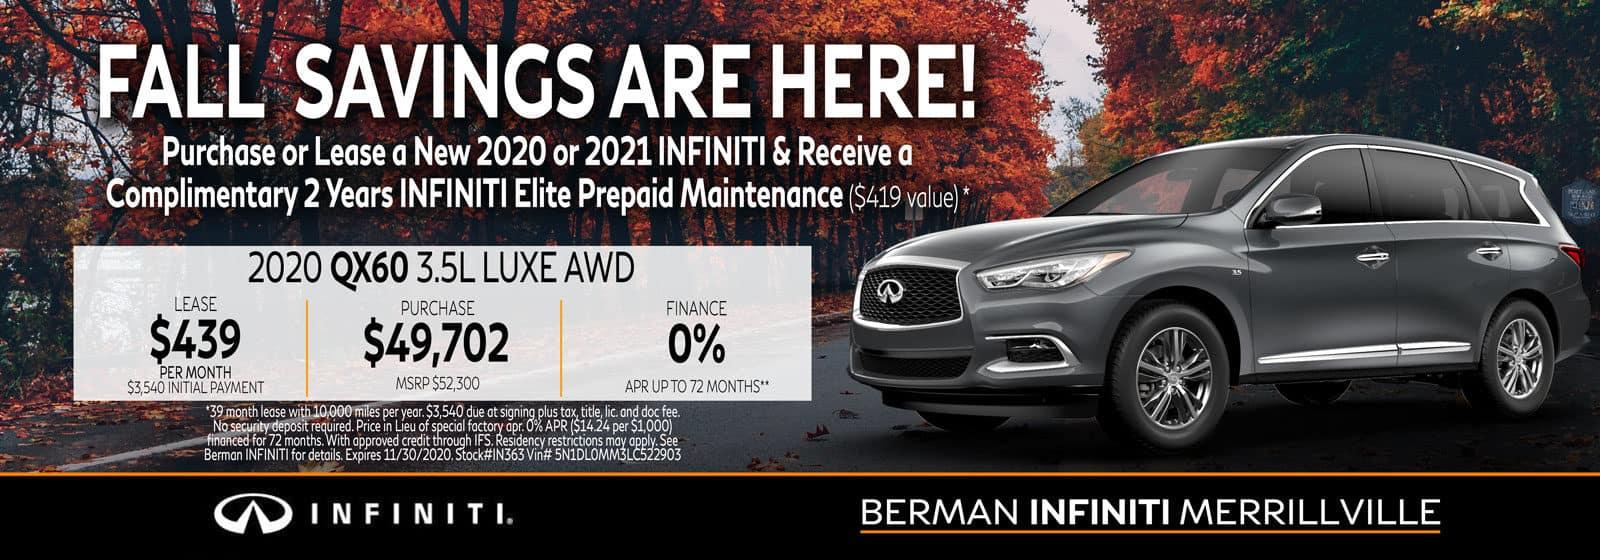 New 2020 INFINITI QX60 November Offer at Berman INFINITI of Merrillville!